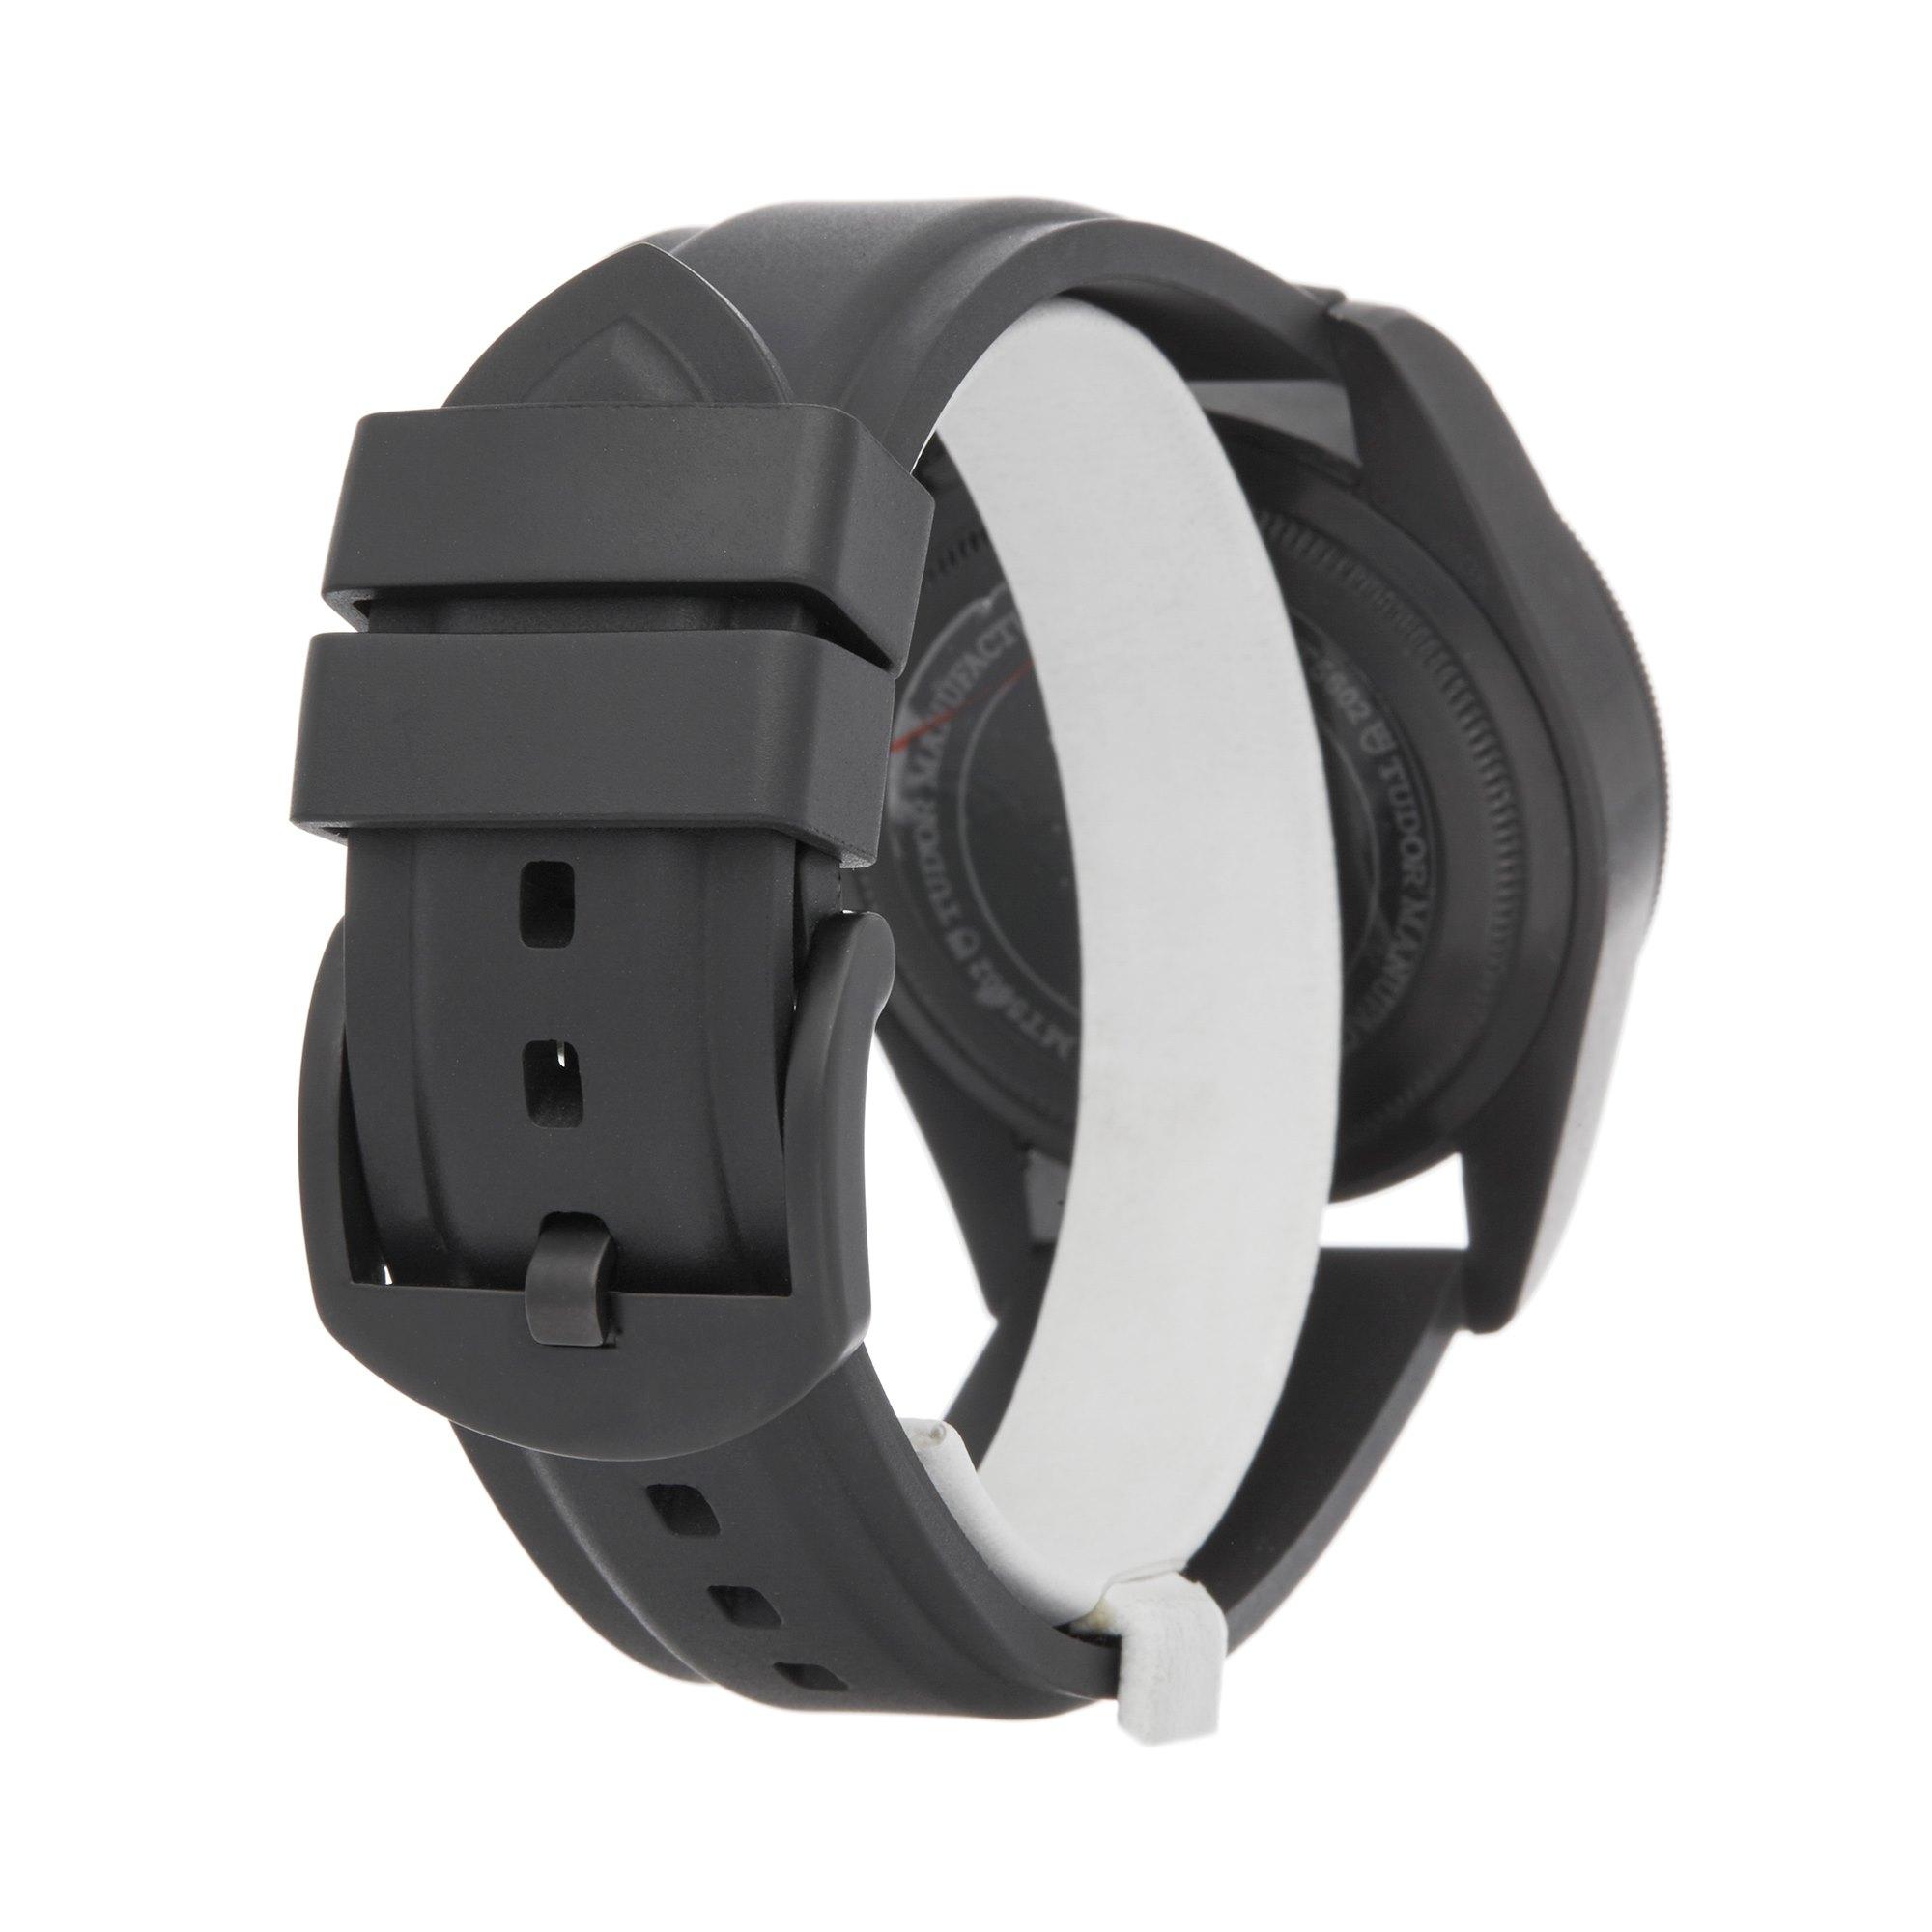 Lot 15 - Tudor Black Bay Heritage 79230DK Men DLC Coated Stainless Steel Watch